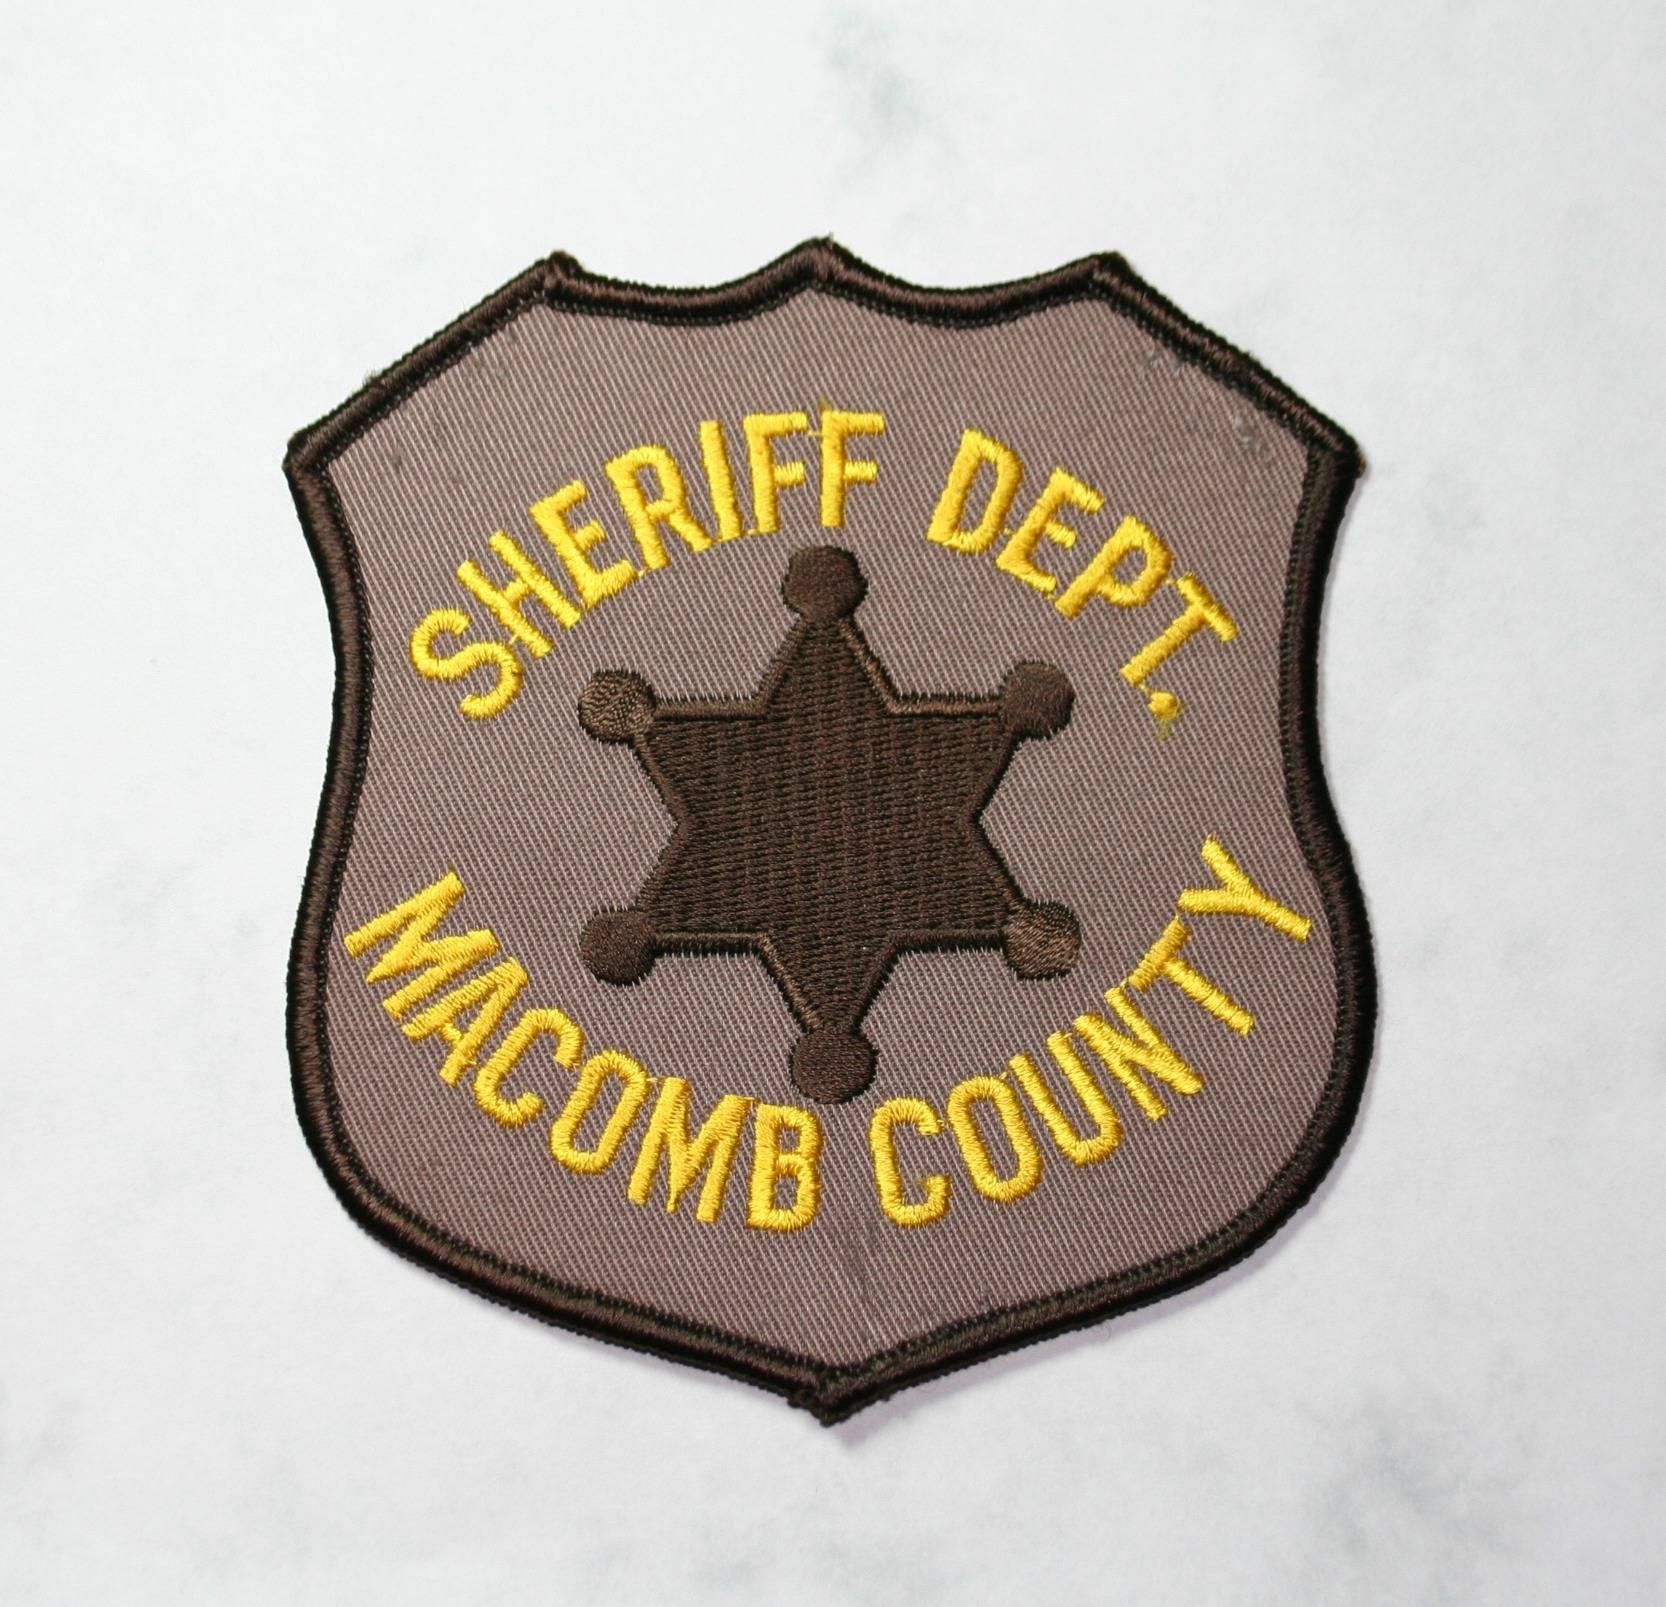 Macomb Co. Sheriff, old